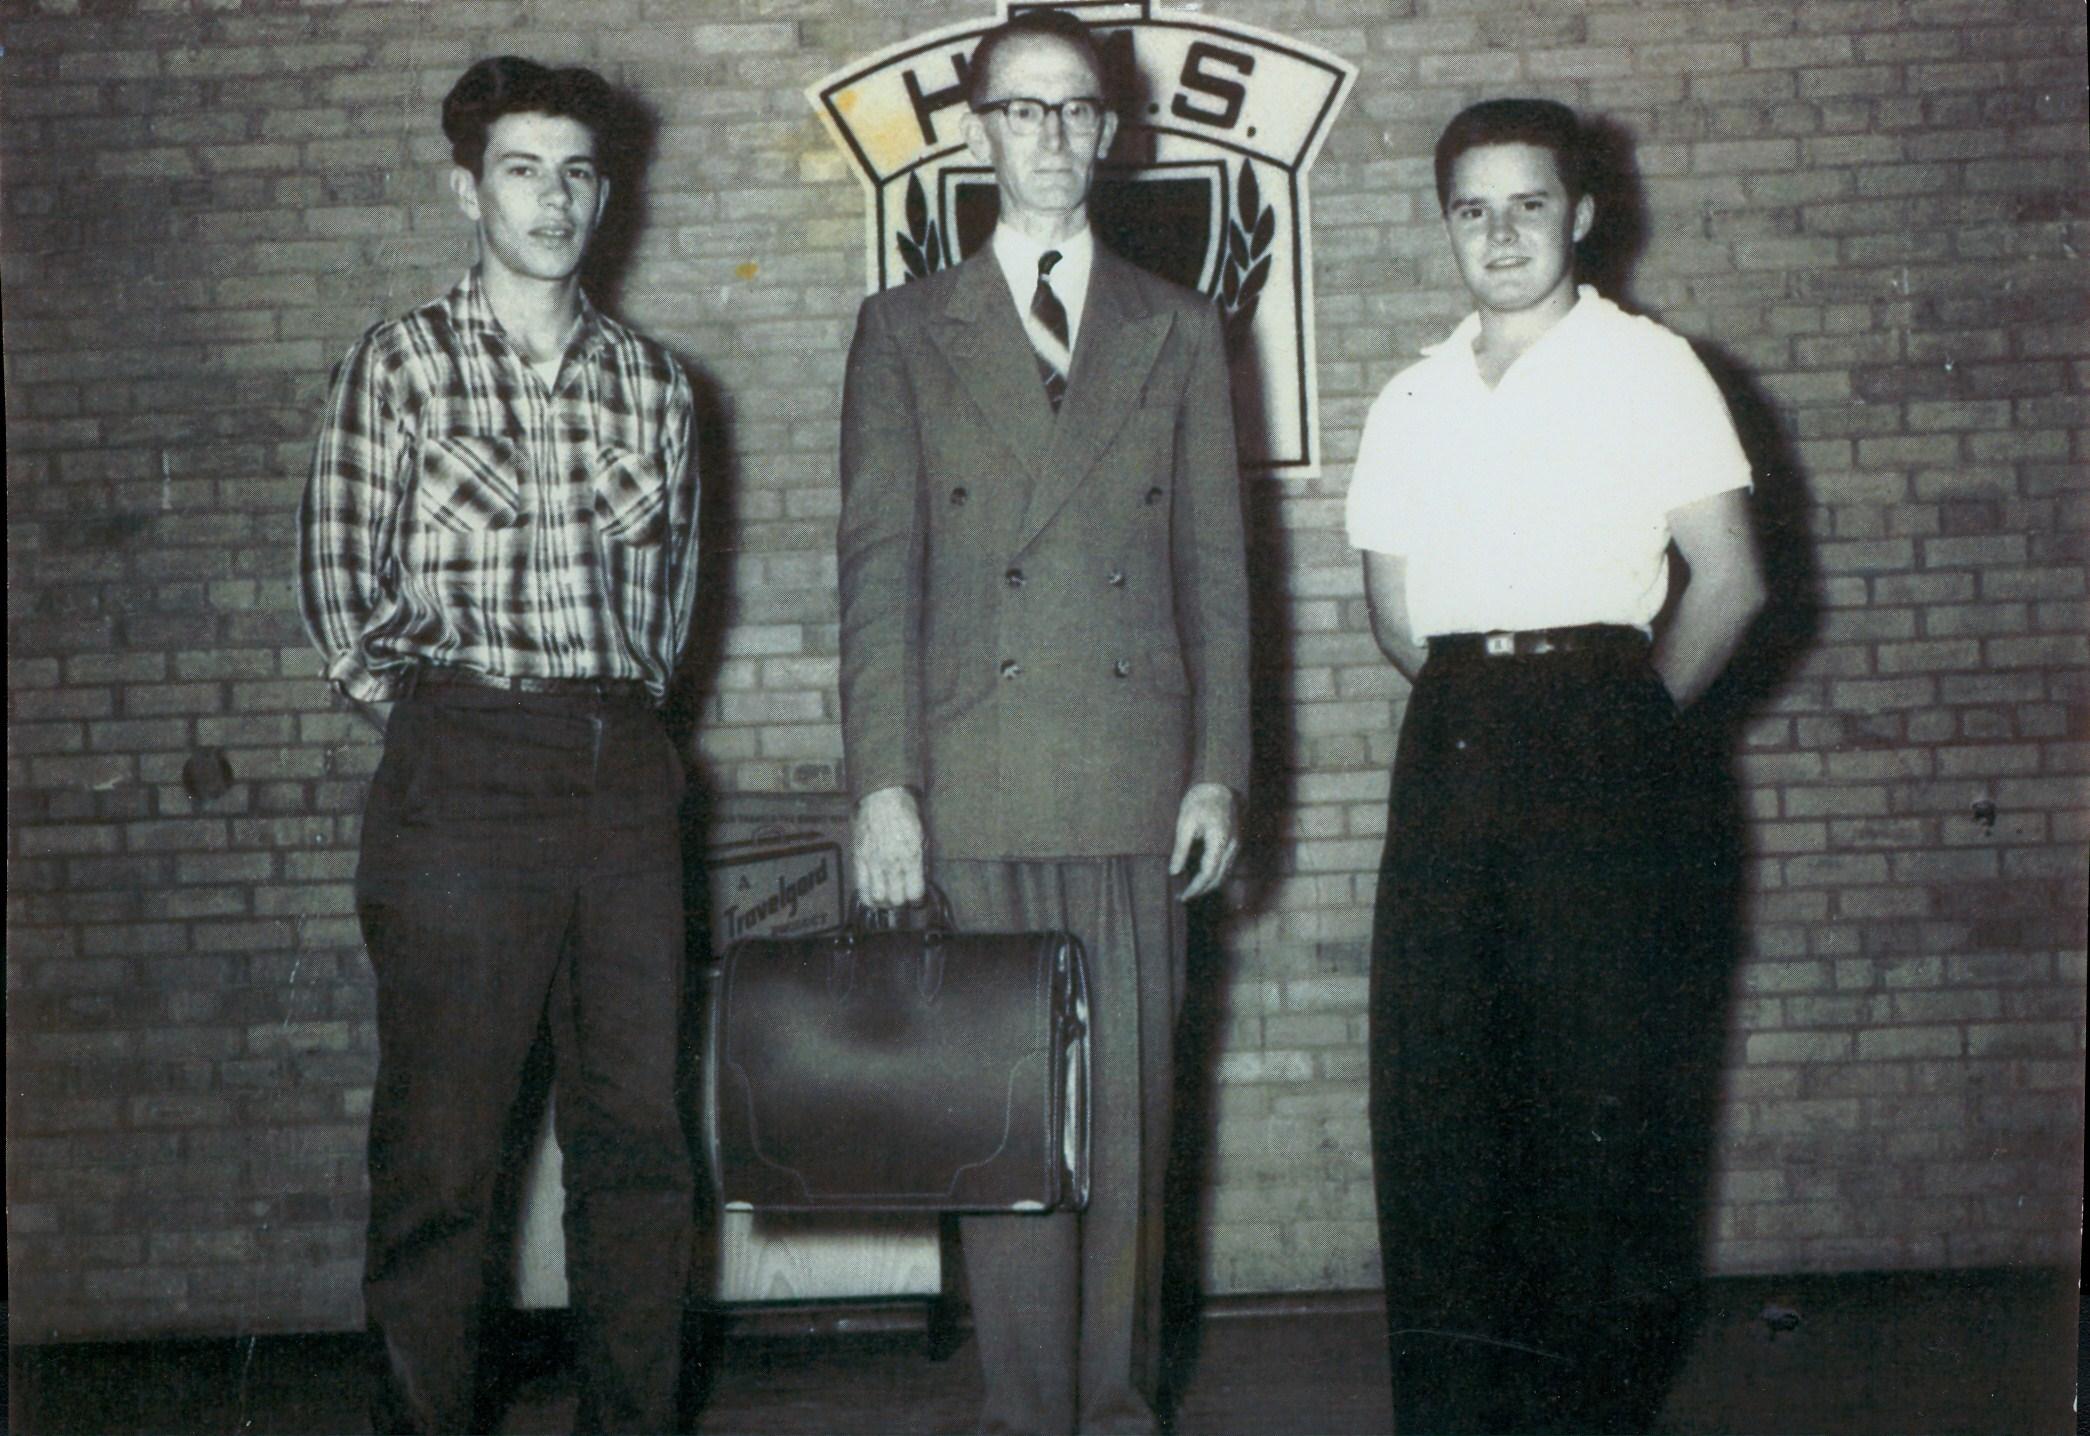 D. Wright, L. McGinnis, R. Jones